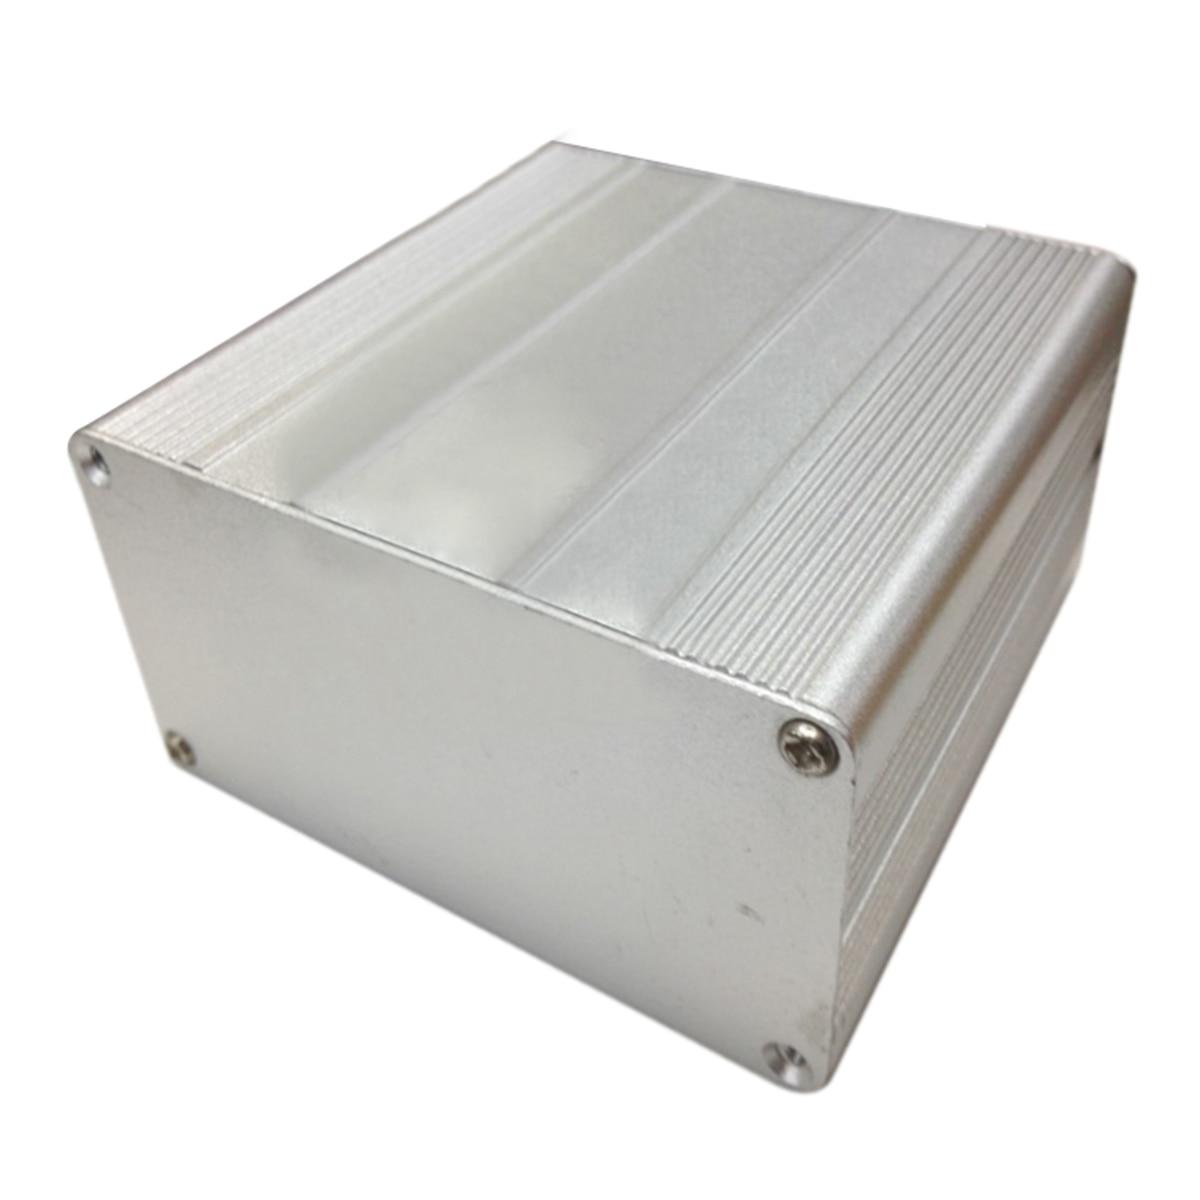 Mayitr Extruded Aluminum Enclosure Case DIY Electronic Project PCB Instrument Box DIY 100x100x50mm 1pc sand blasting oxidation black aluminum case diy project electronic line protection box 10 x 9 7 x 4cm promotion